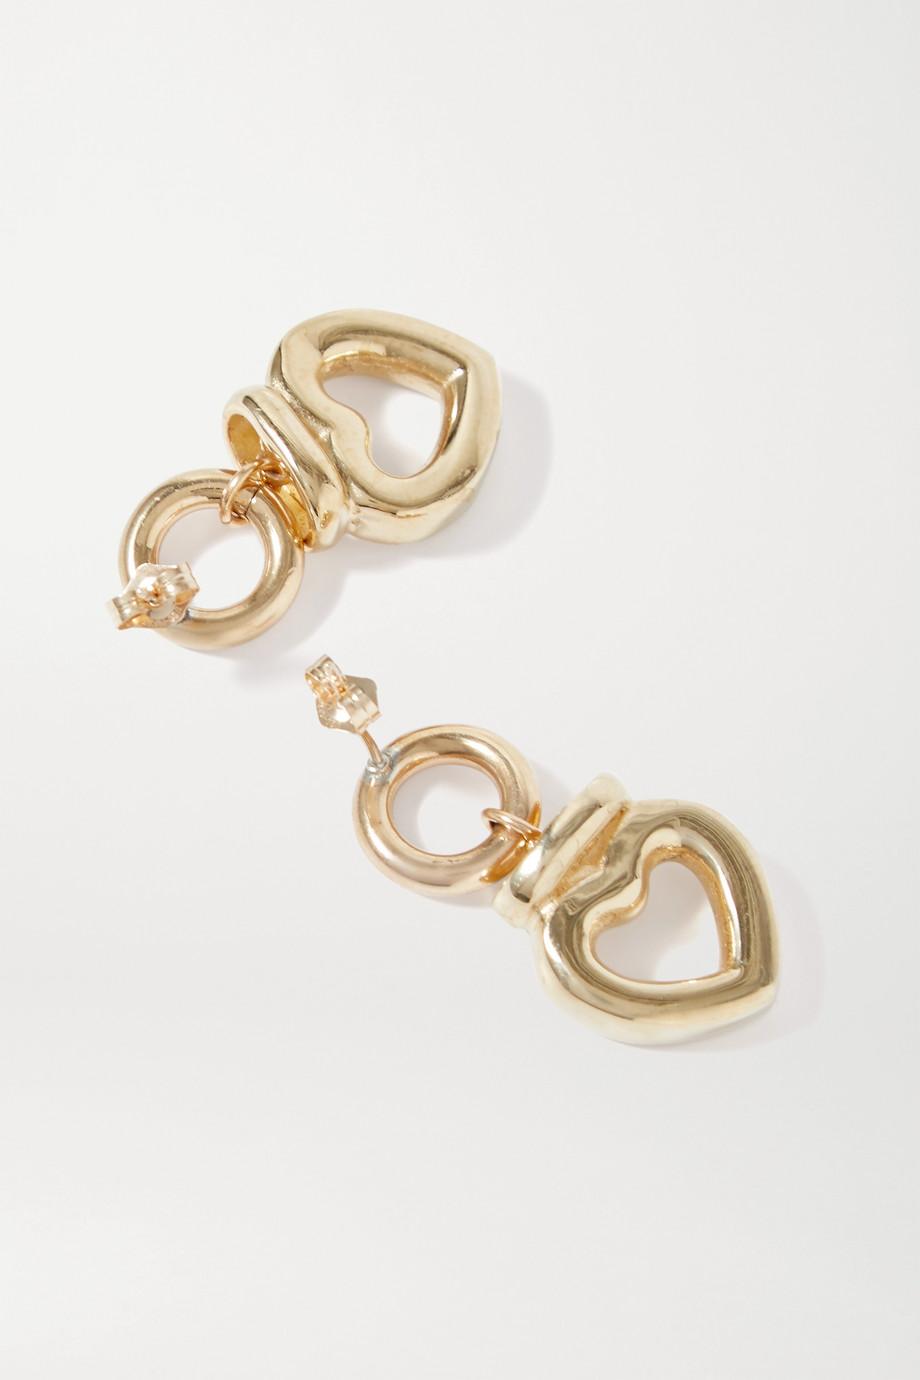 Laura Lombardi Dolce gold-tone earrings